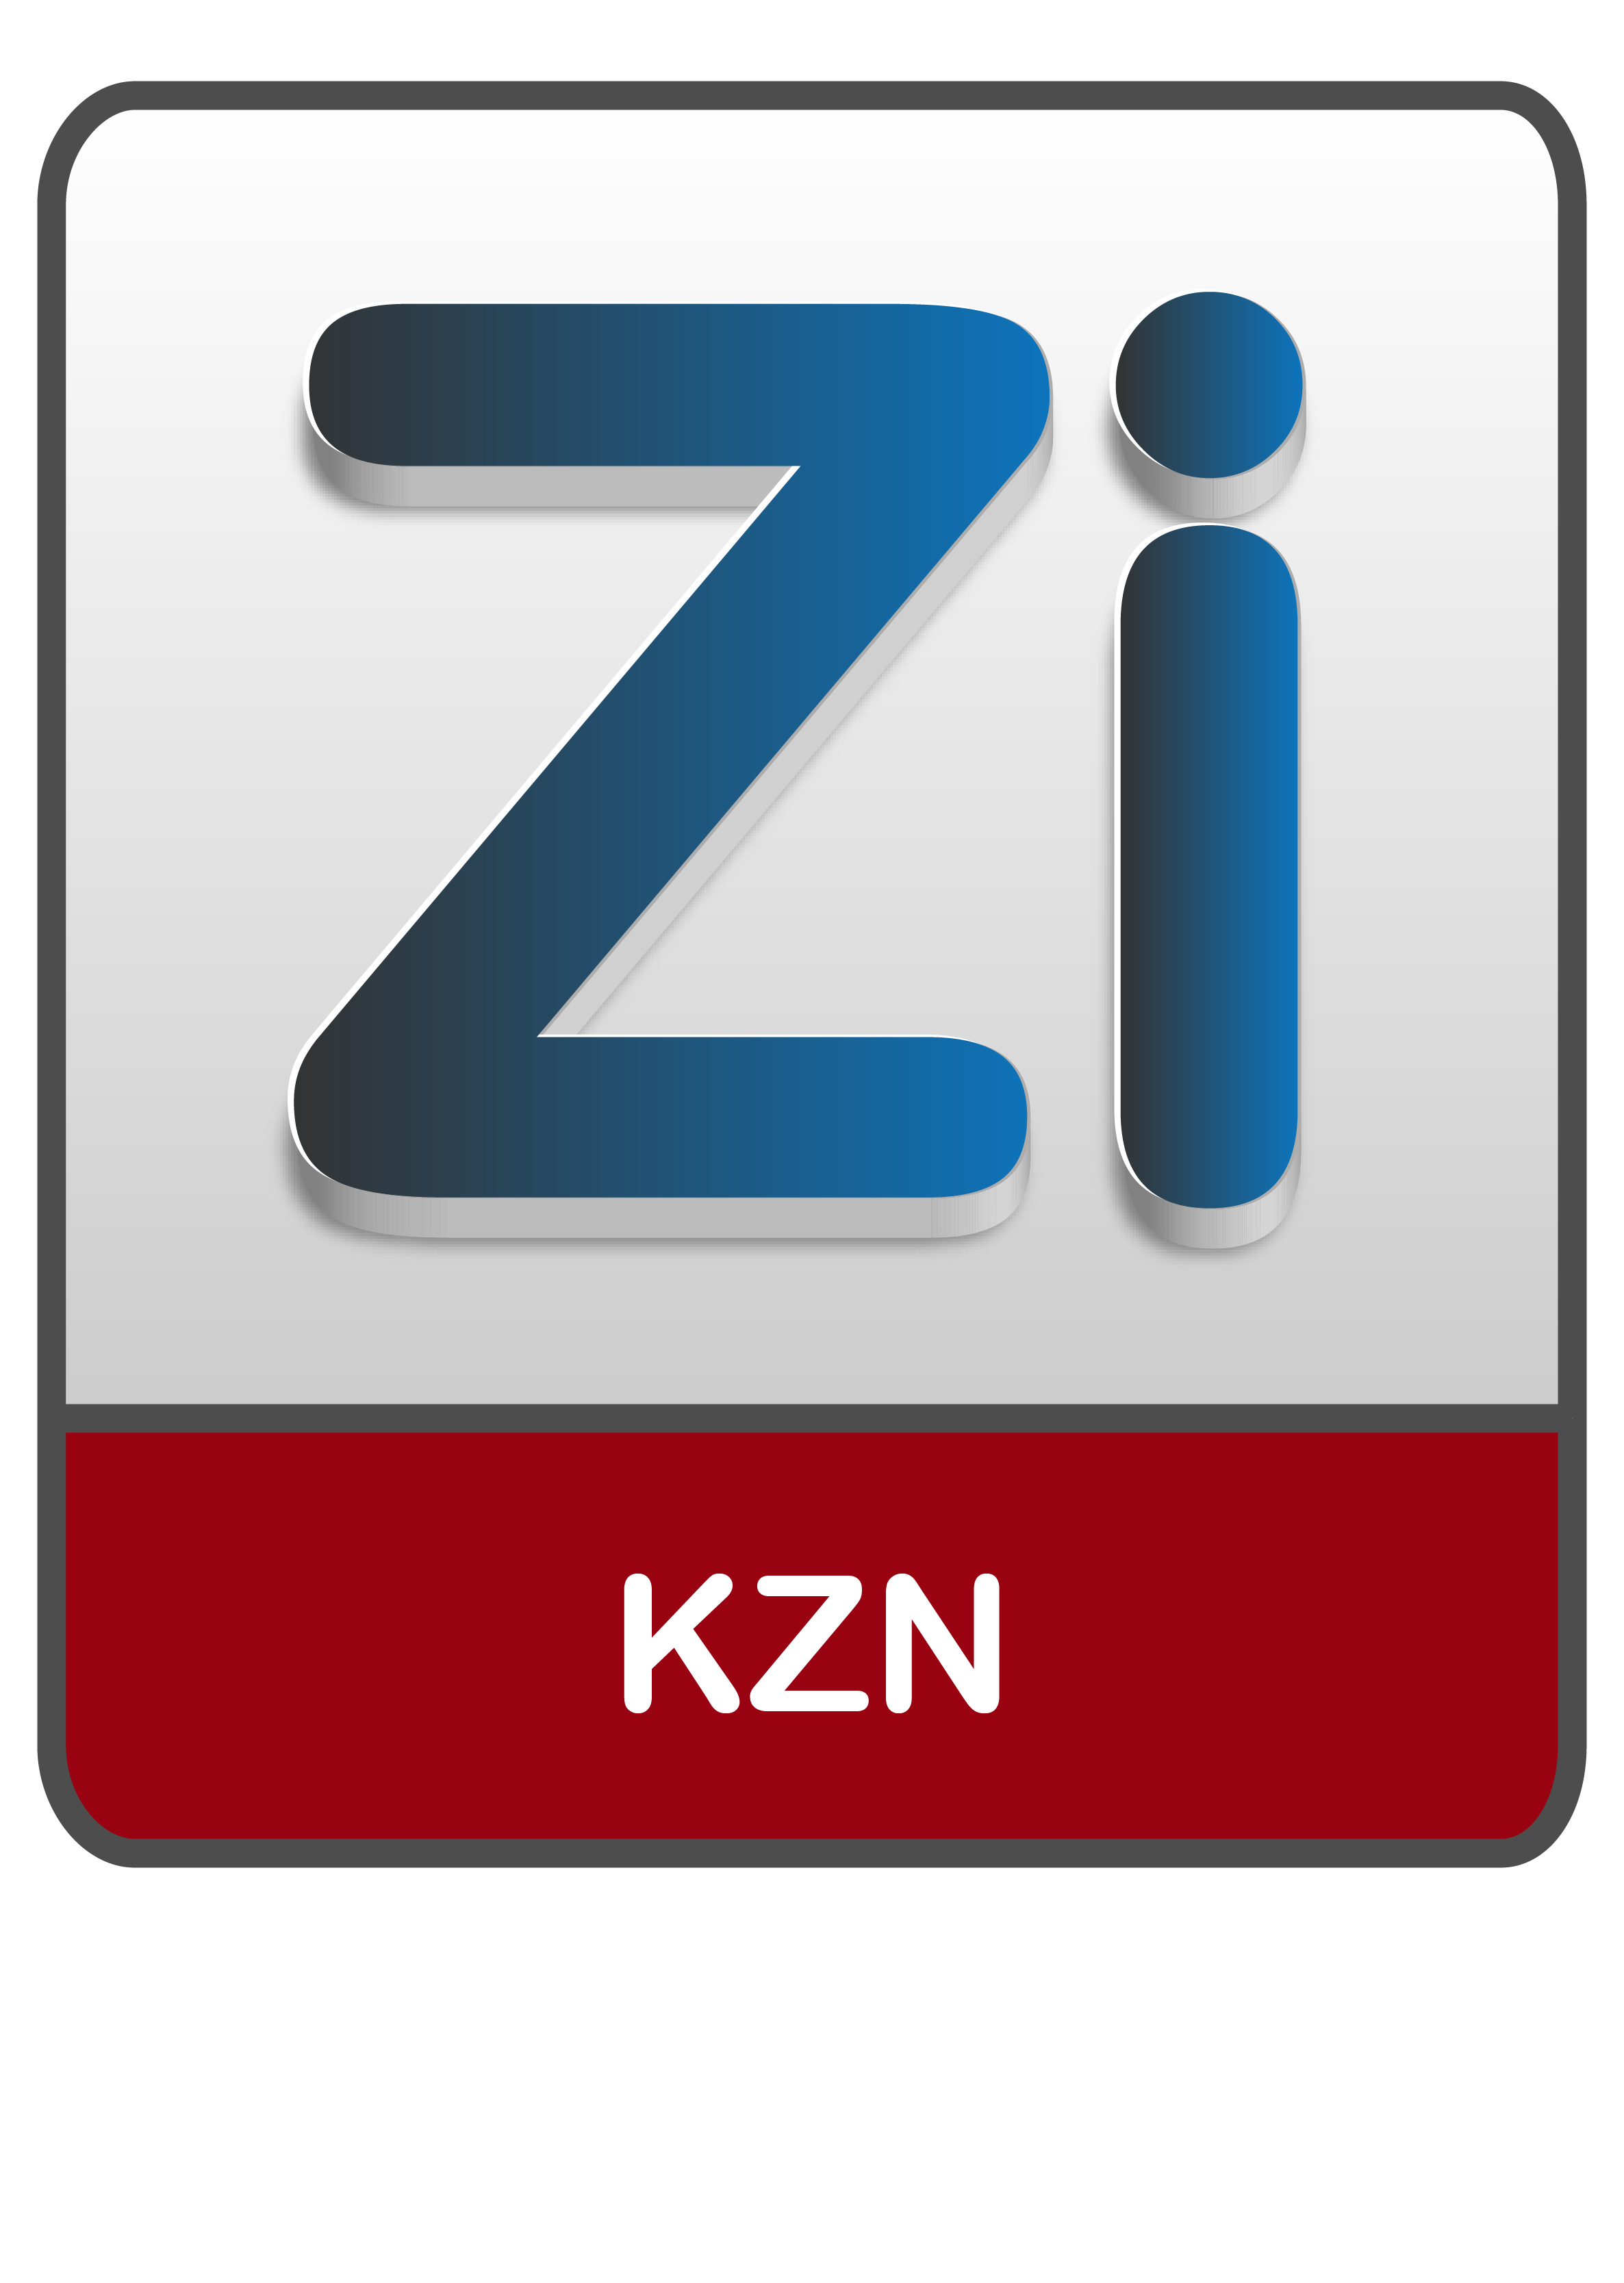 Peri-Peri-Creative-zipcord-industries-logo2017_Zipcord-KZN